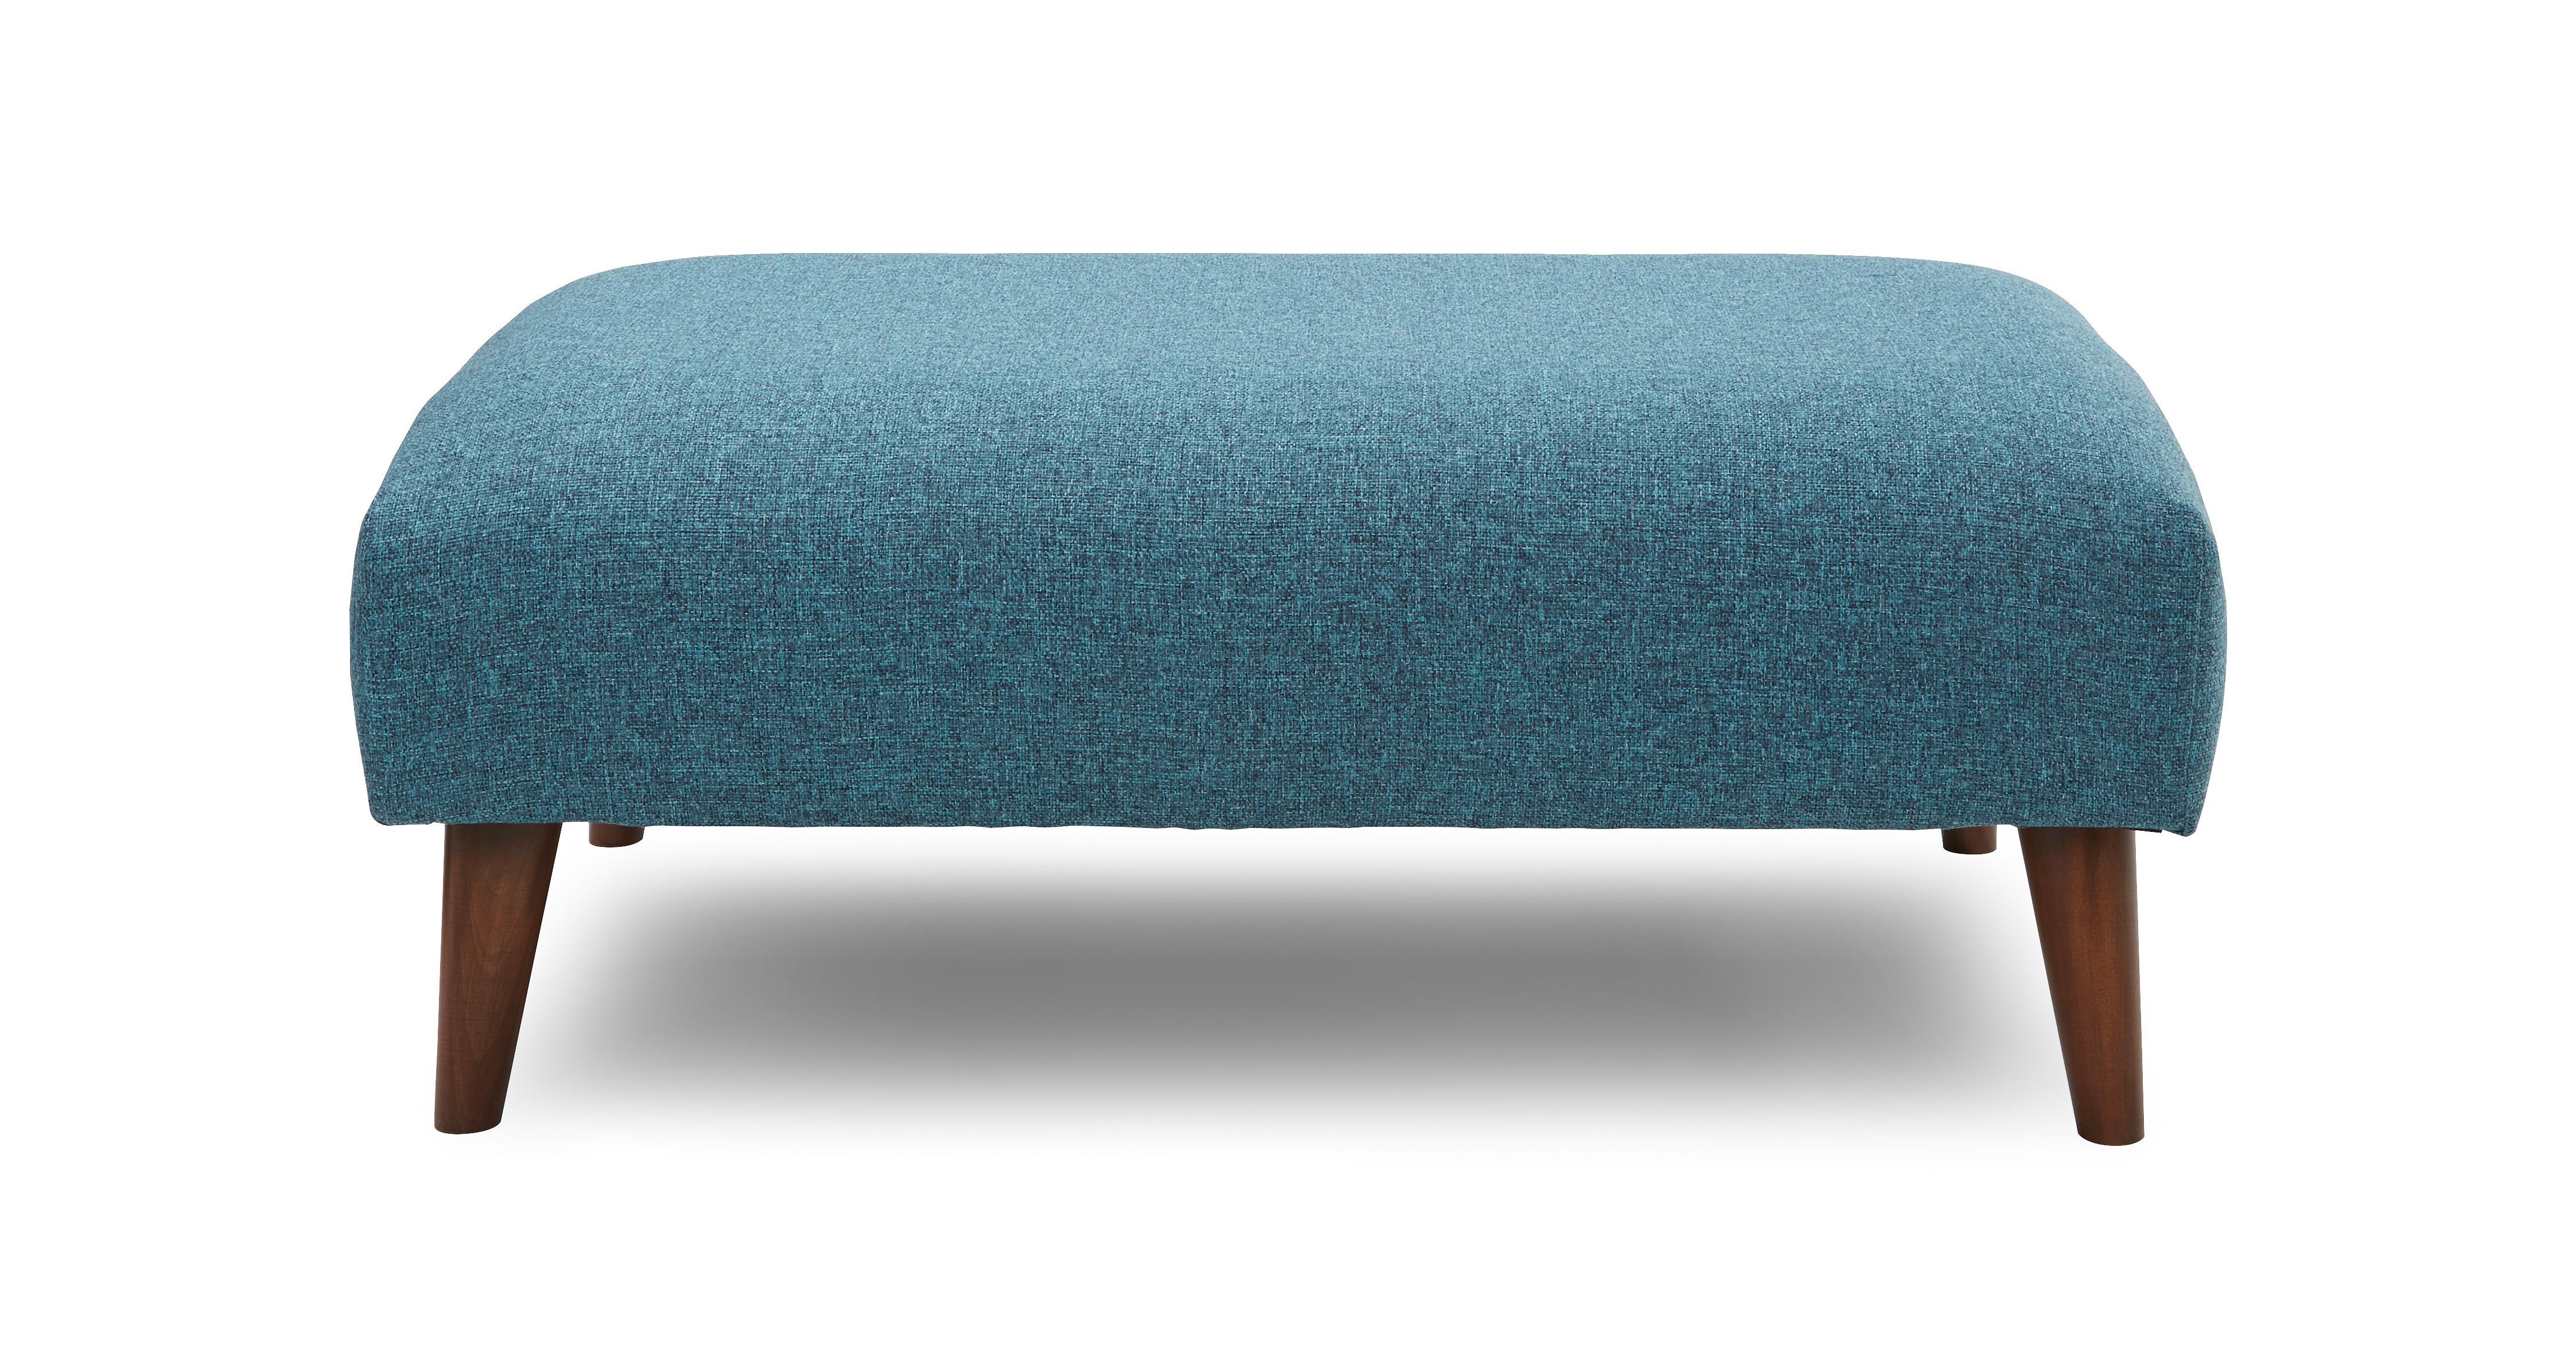 Zinc Express Plain Large Footstool Dfs